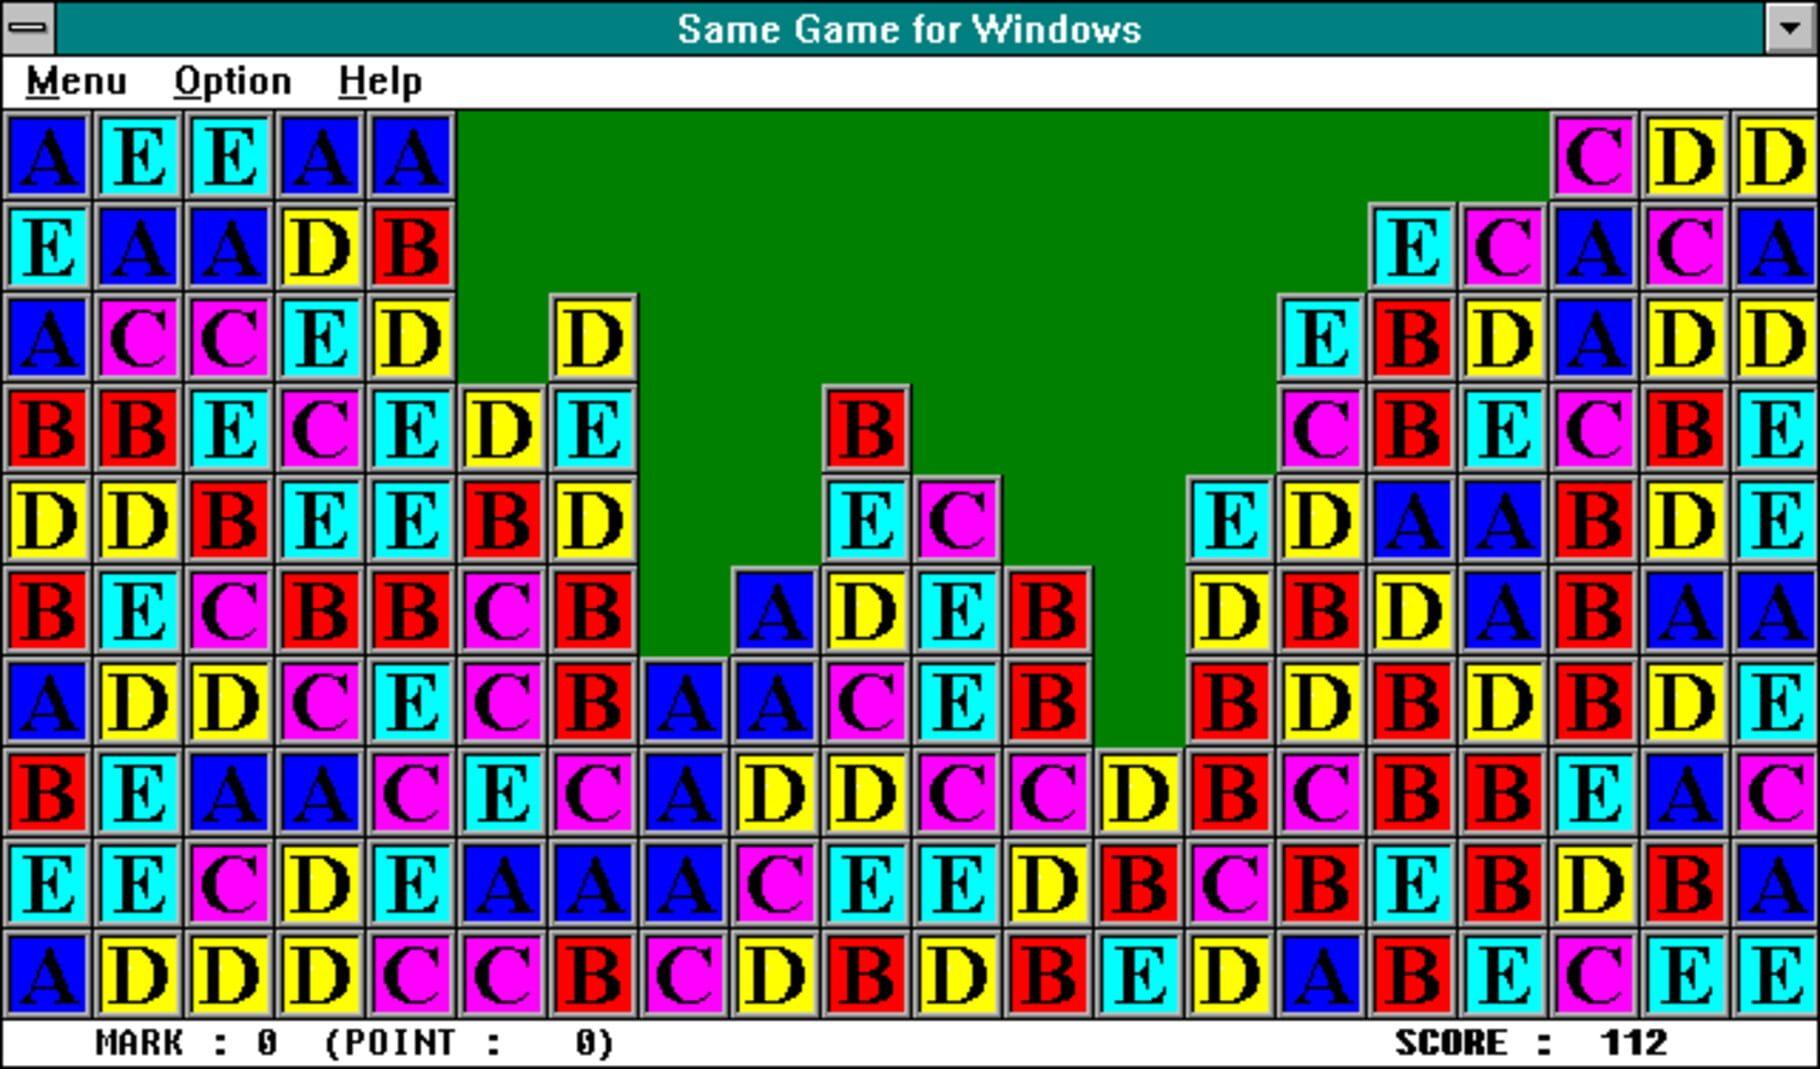 buy Same Game for Windows cd key for all platform